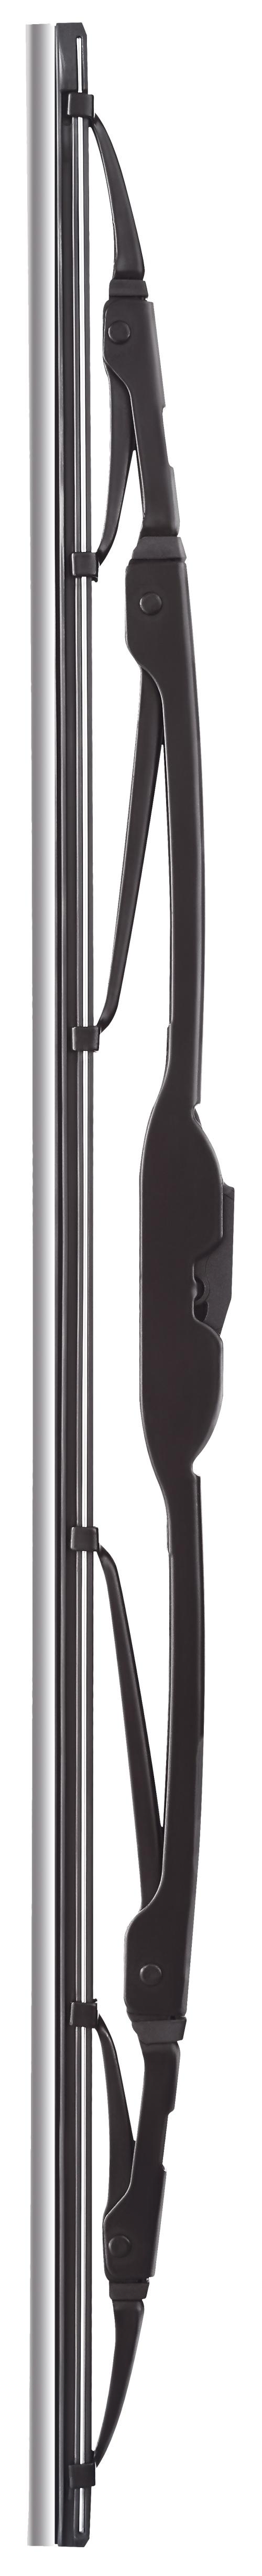 Фото - Щетка стеклоочистителя Hito CLASSIC, каркасная, 22 (550 мм), 1 шт. авто